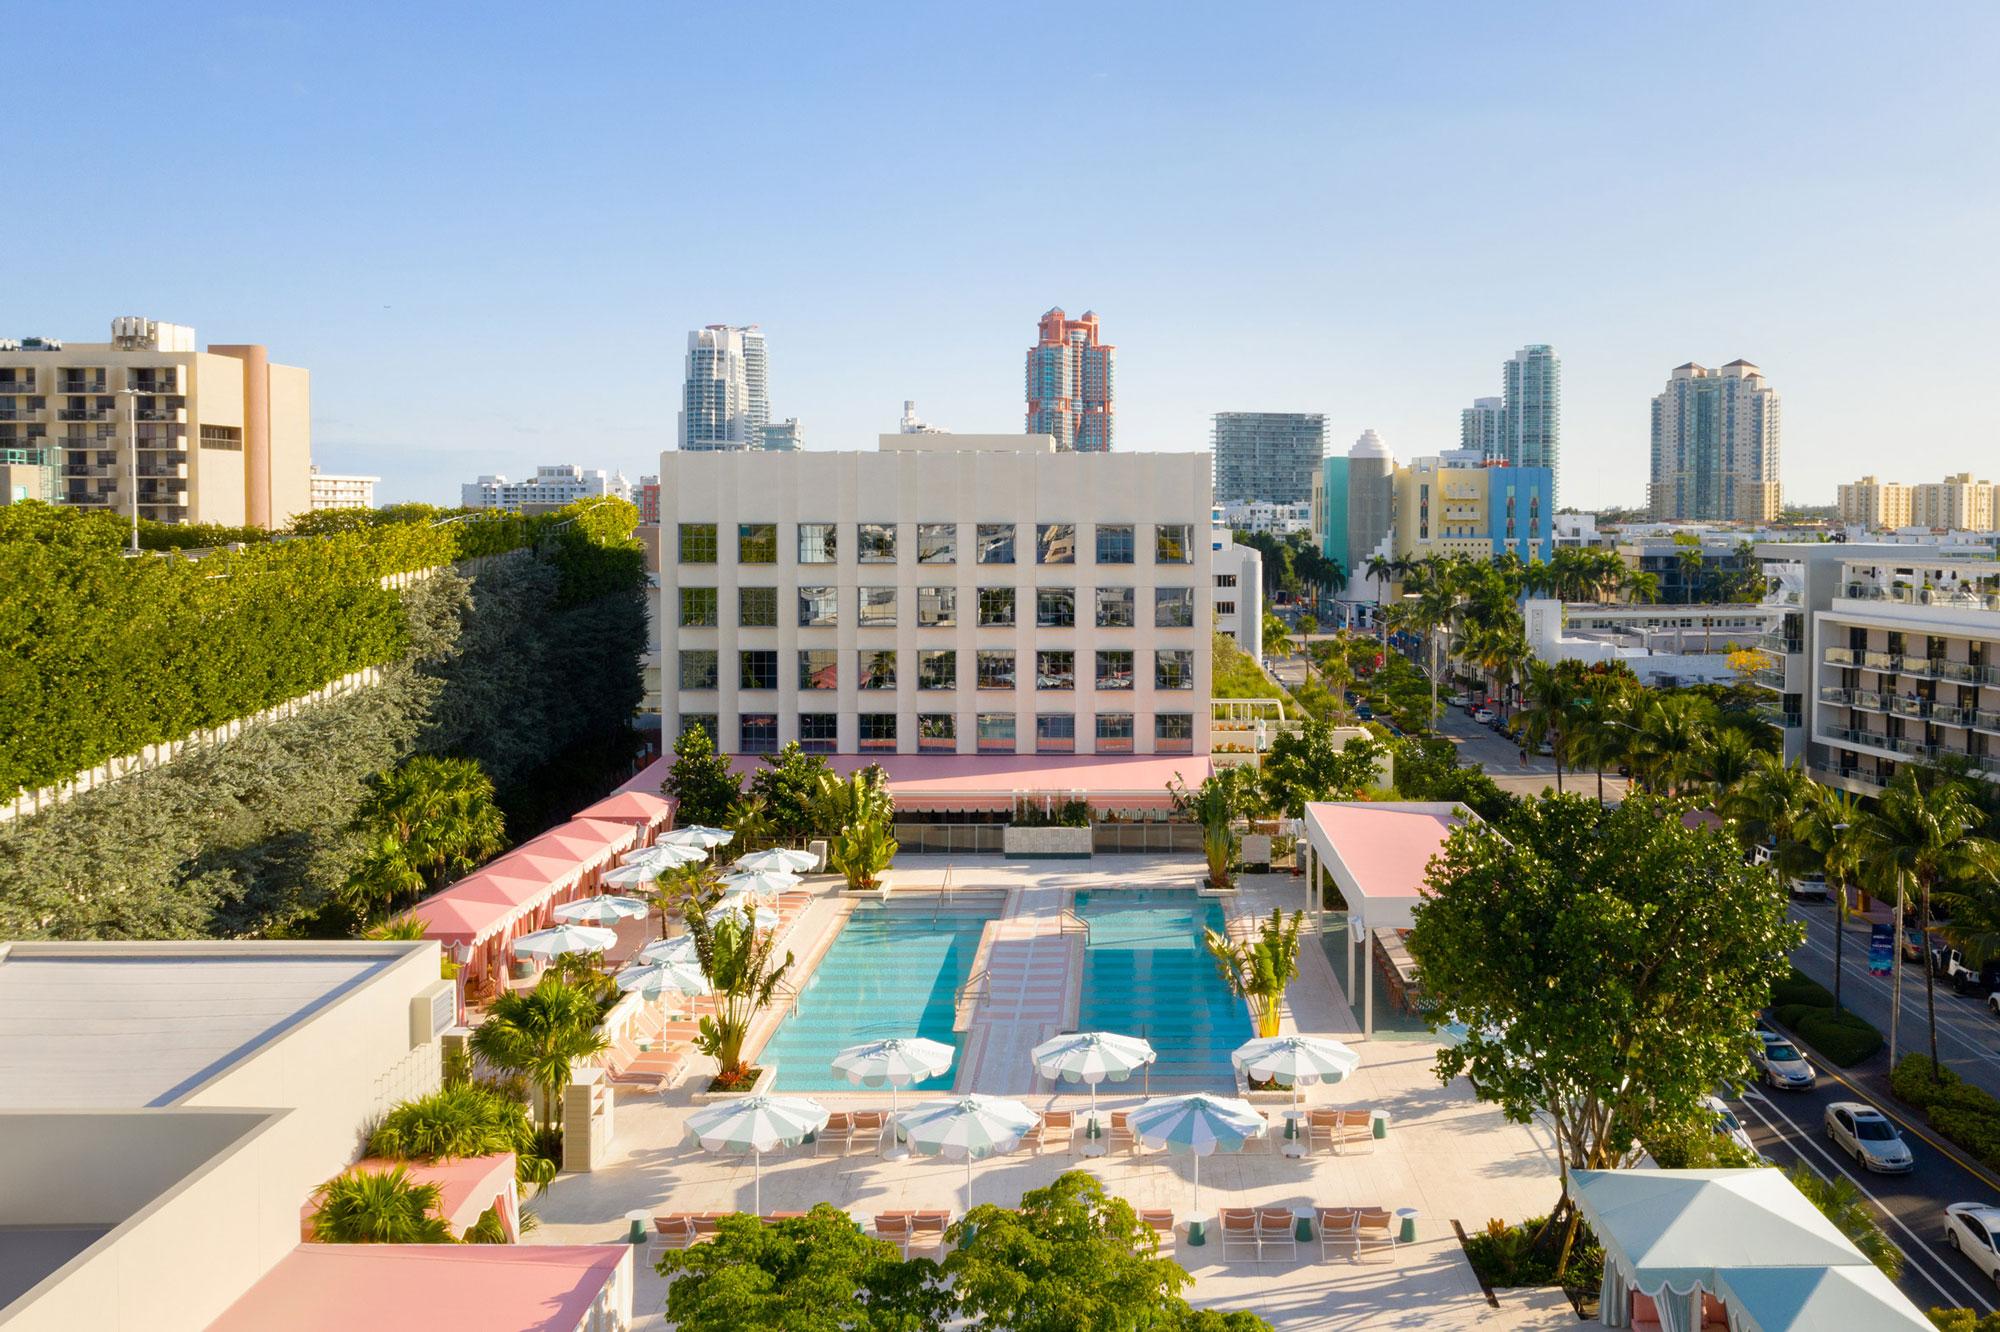 goodtime hotel pharrell williams miami david grutman piscina cores pastéis arquitetura construção